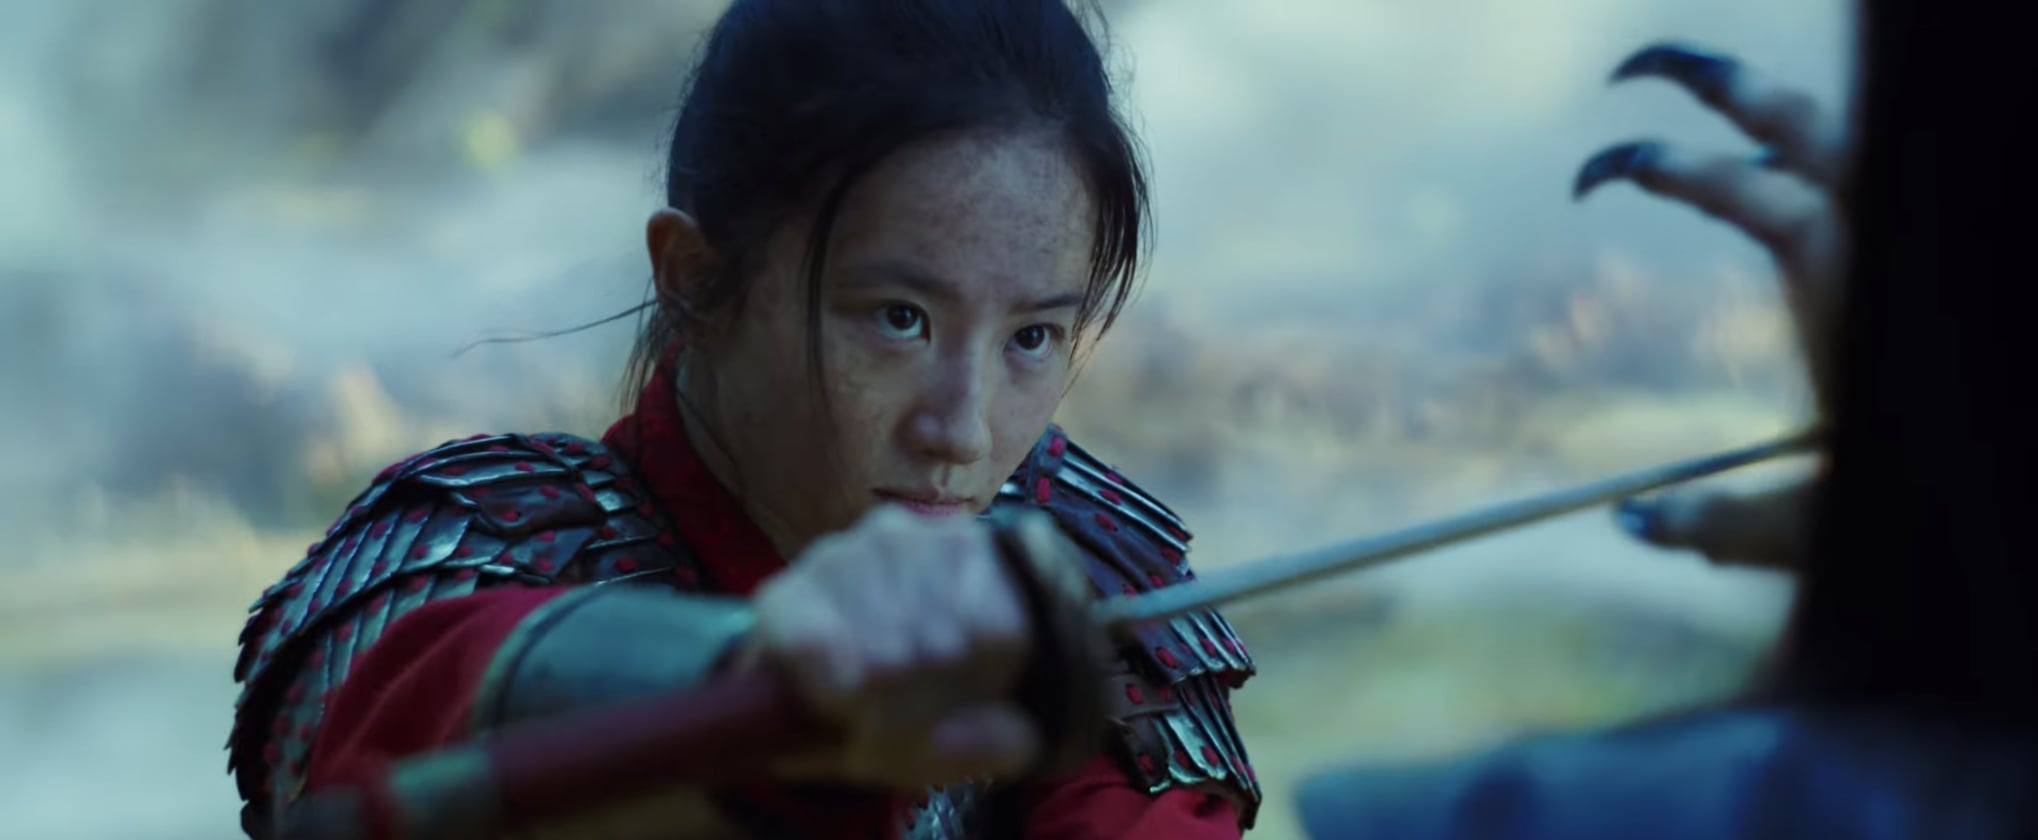 Disney's Mulan Live-Action Reboot Trailer